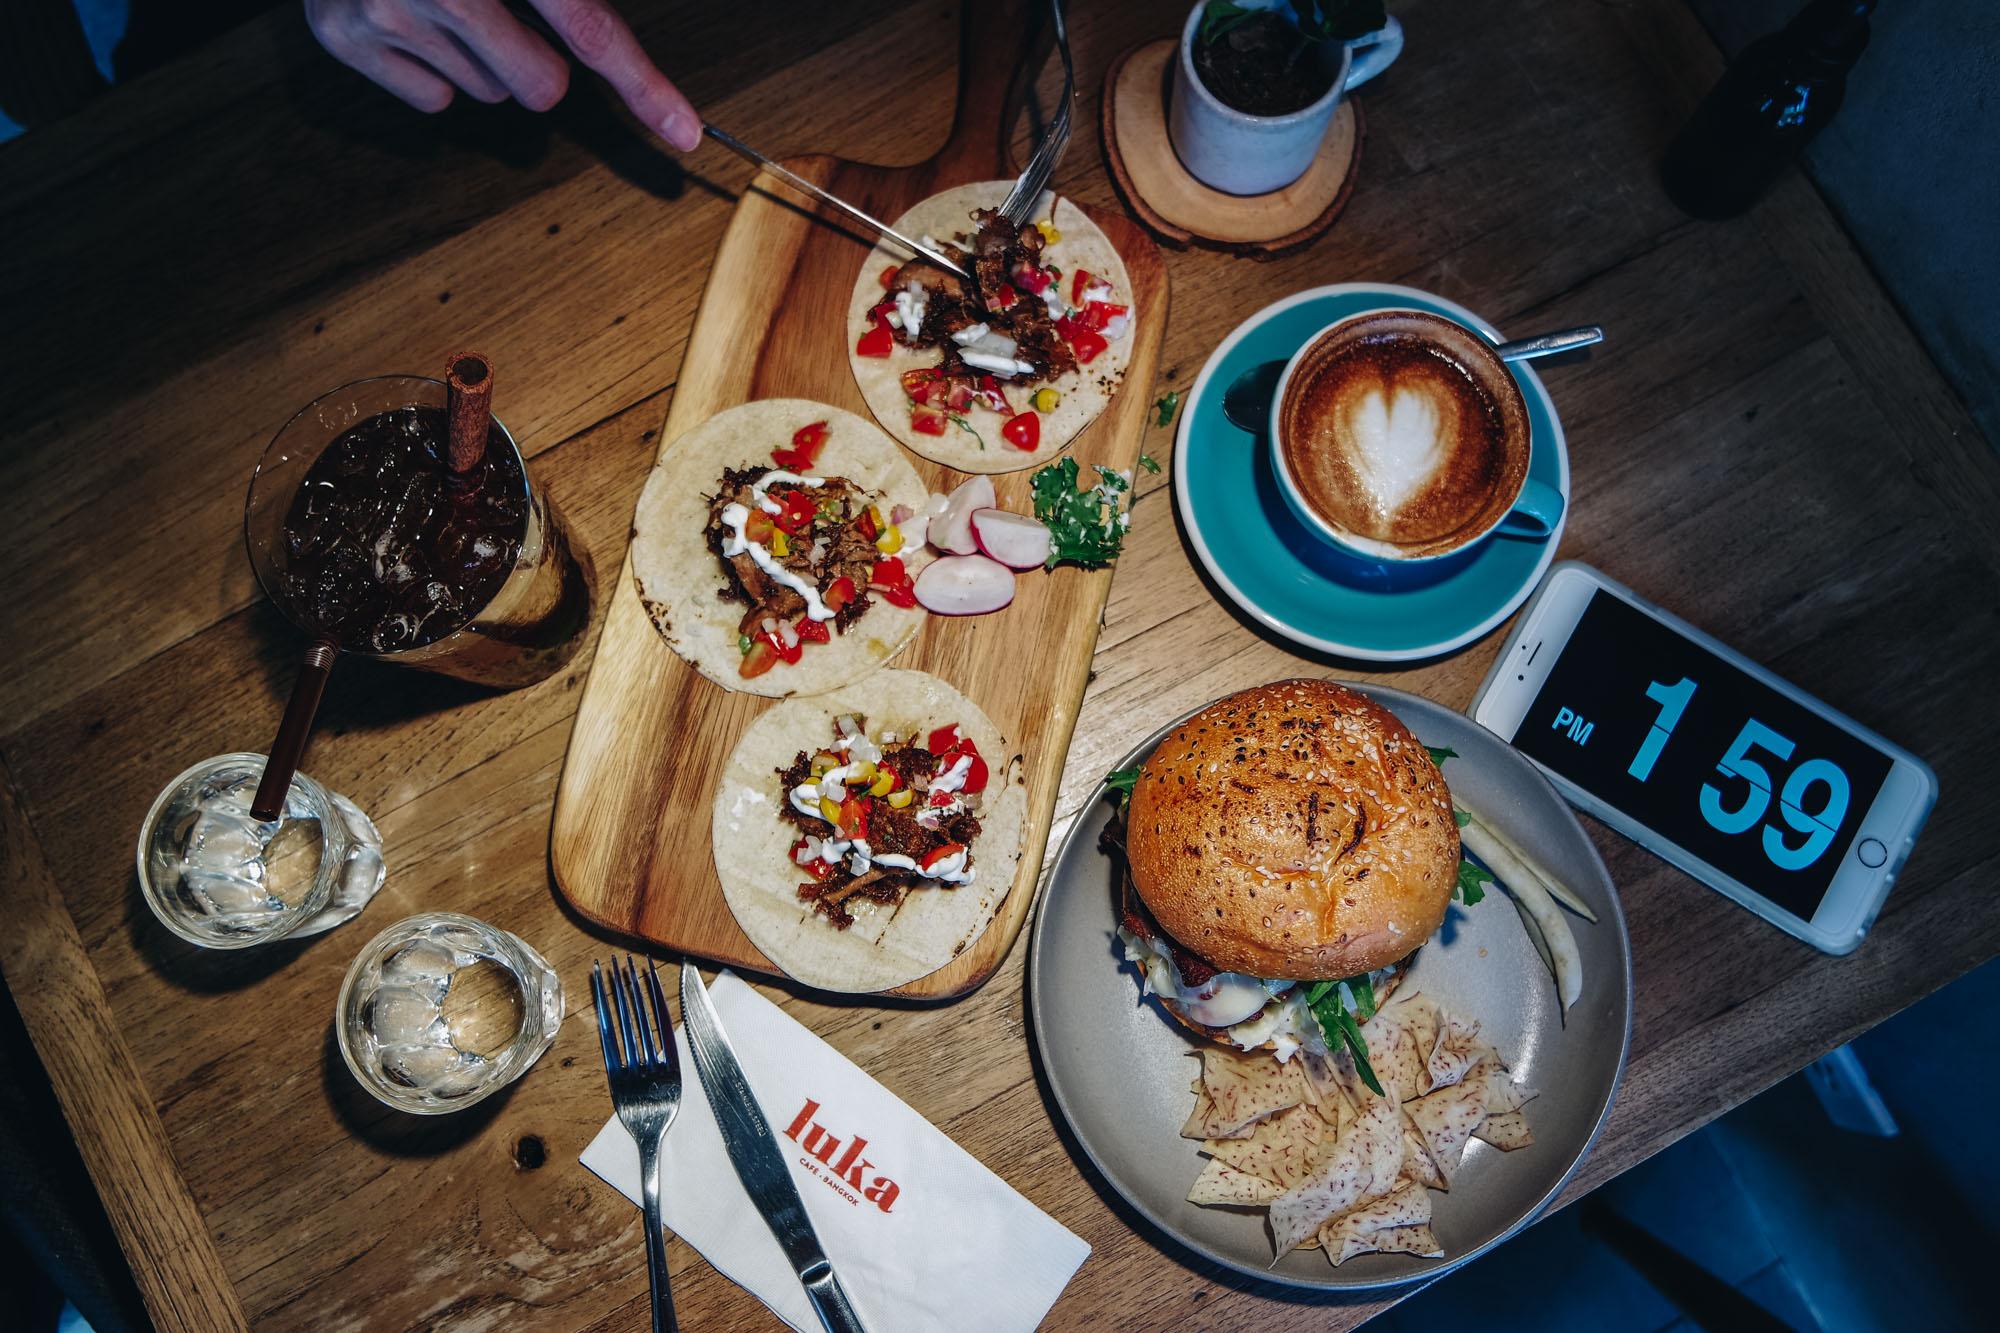 luka-cafe-bangkok-darrenbloggie-5249